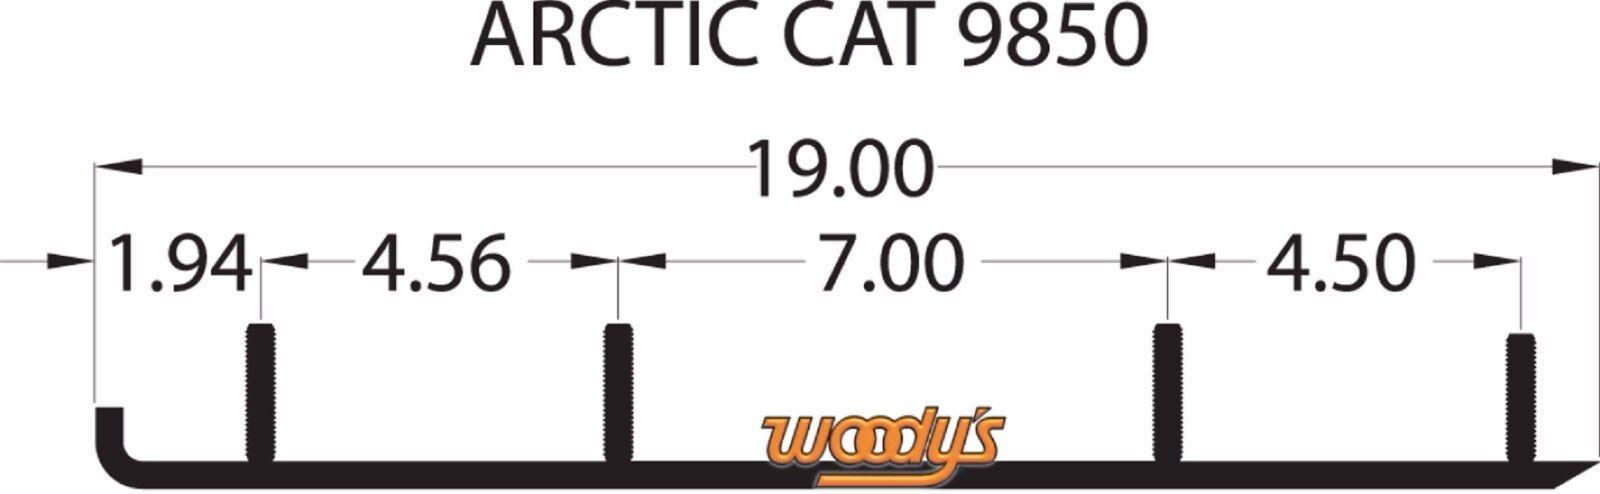 "WOODYS DOOLY 6/"" WEAR BARS CARBIDE RUNNERS PAIR FOR ARCTIC CAT 02-17 /& YAMAHA 16"